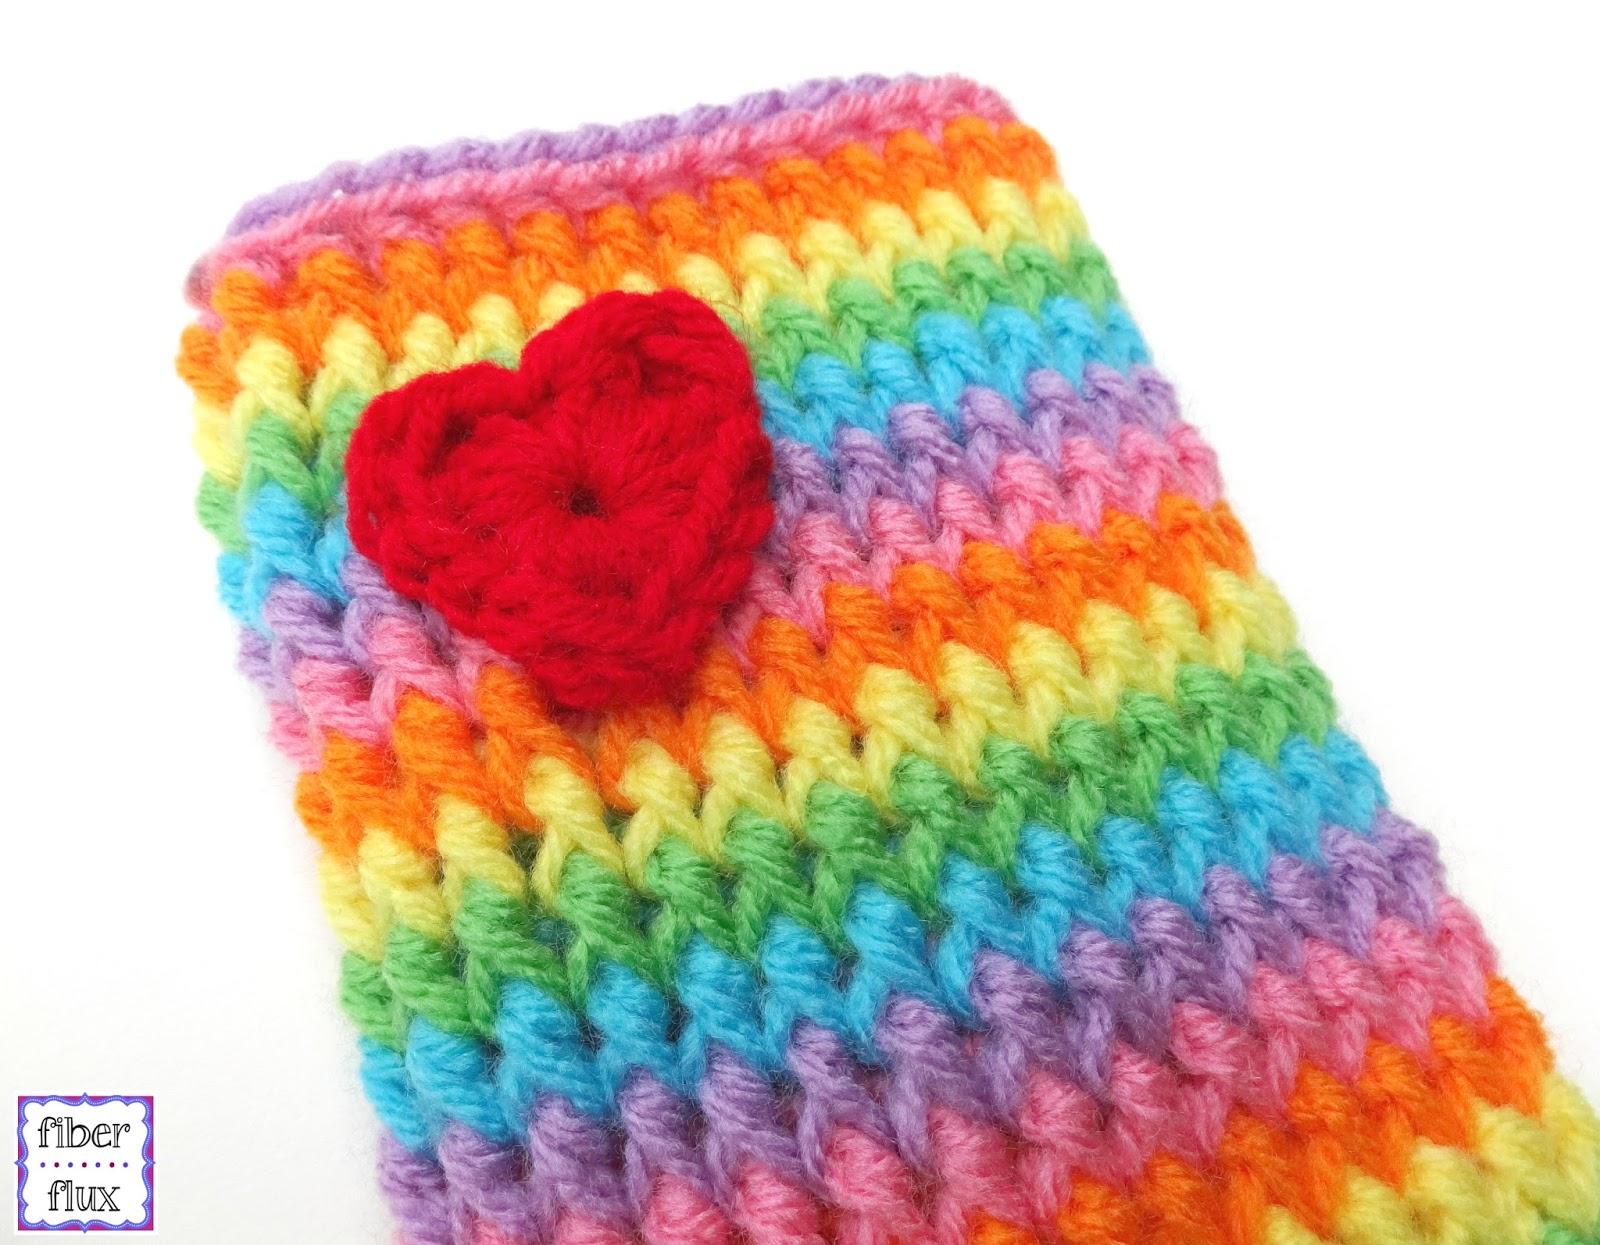 Fiber Flux Free Crochet Patternrainbow Love Legwarmers